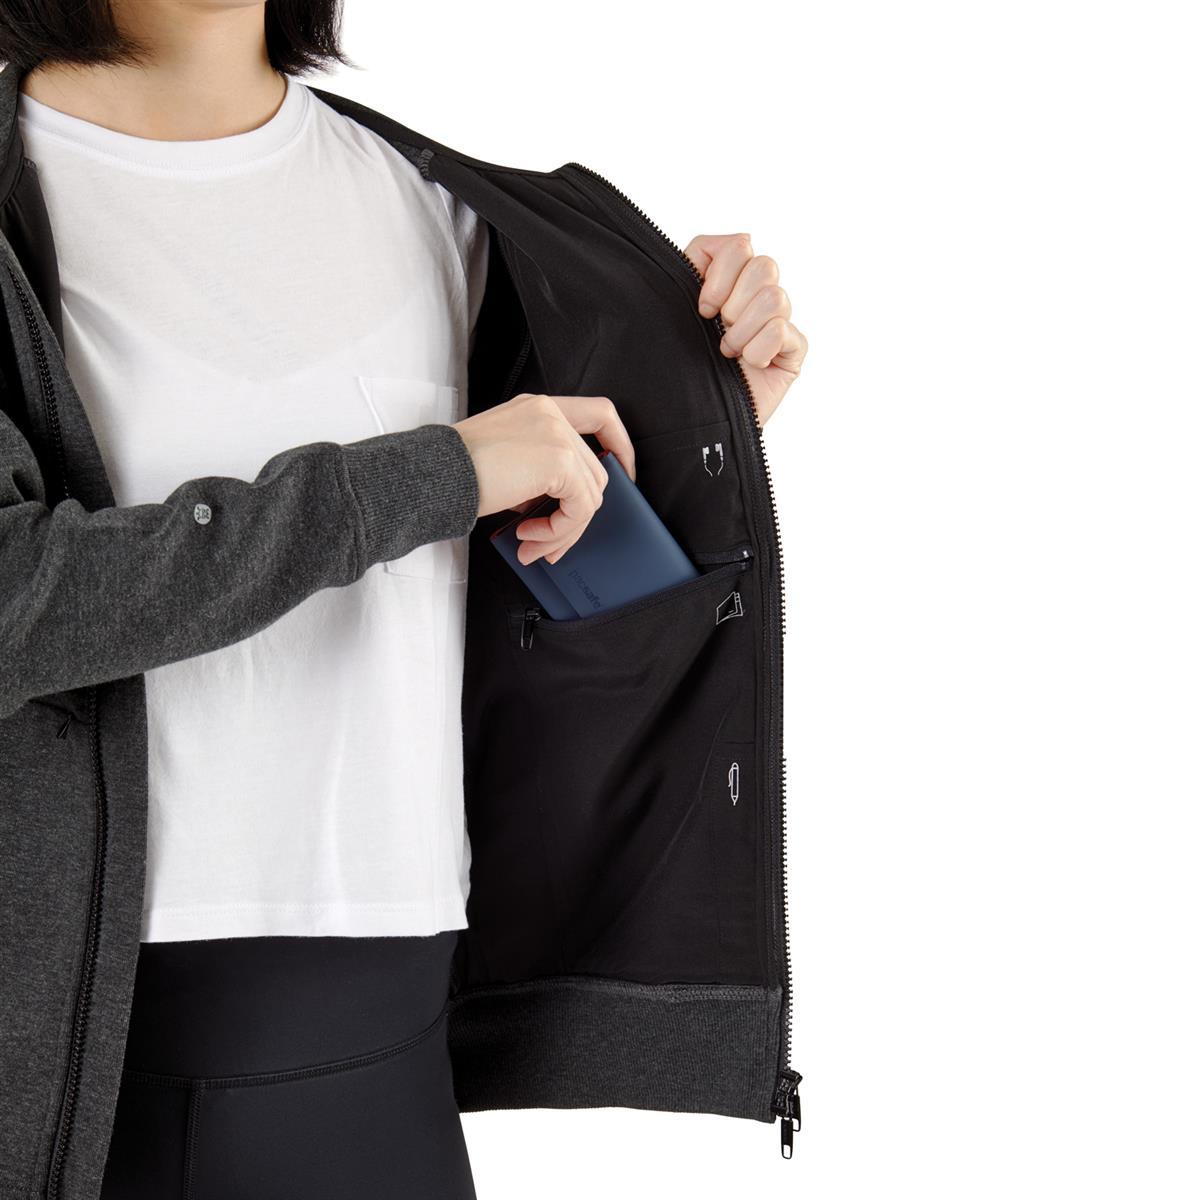 Bluza Transit z Polygiene oraz RFIDsafe marki Pacsafe